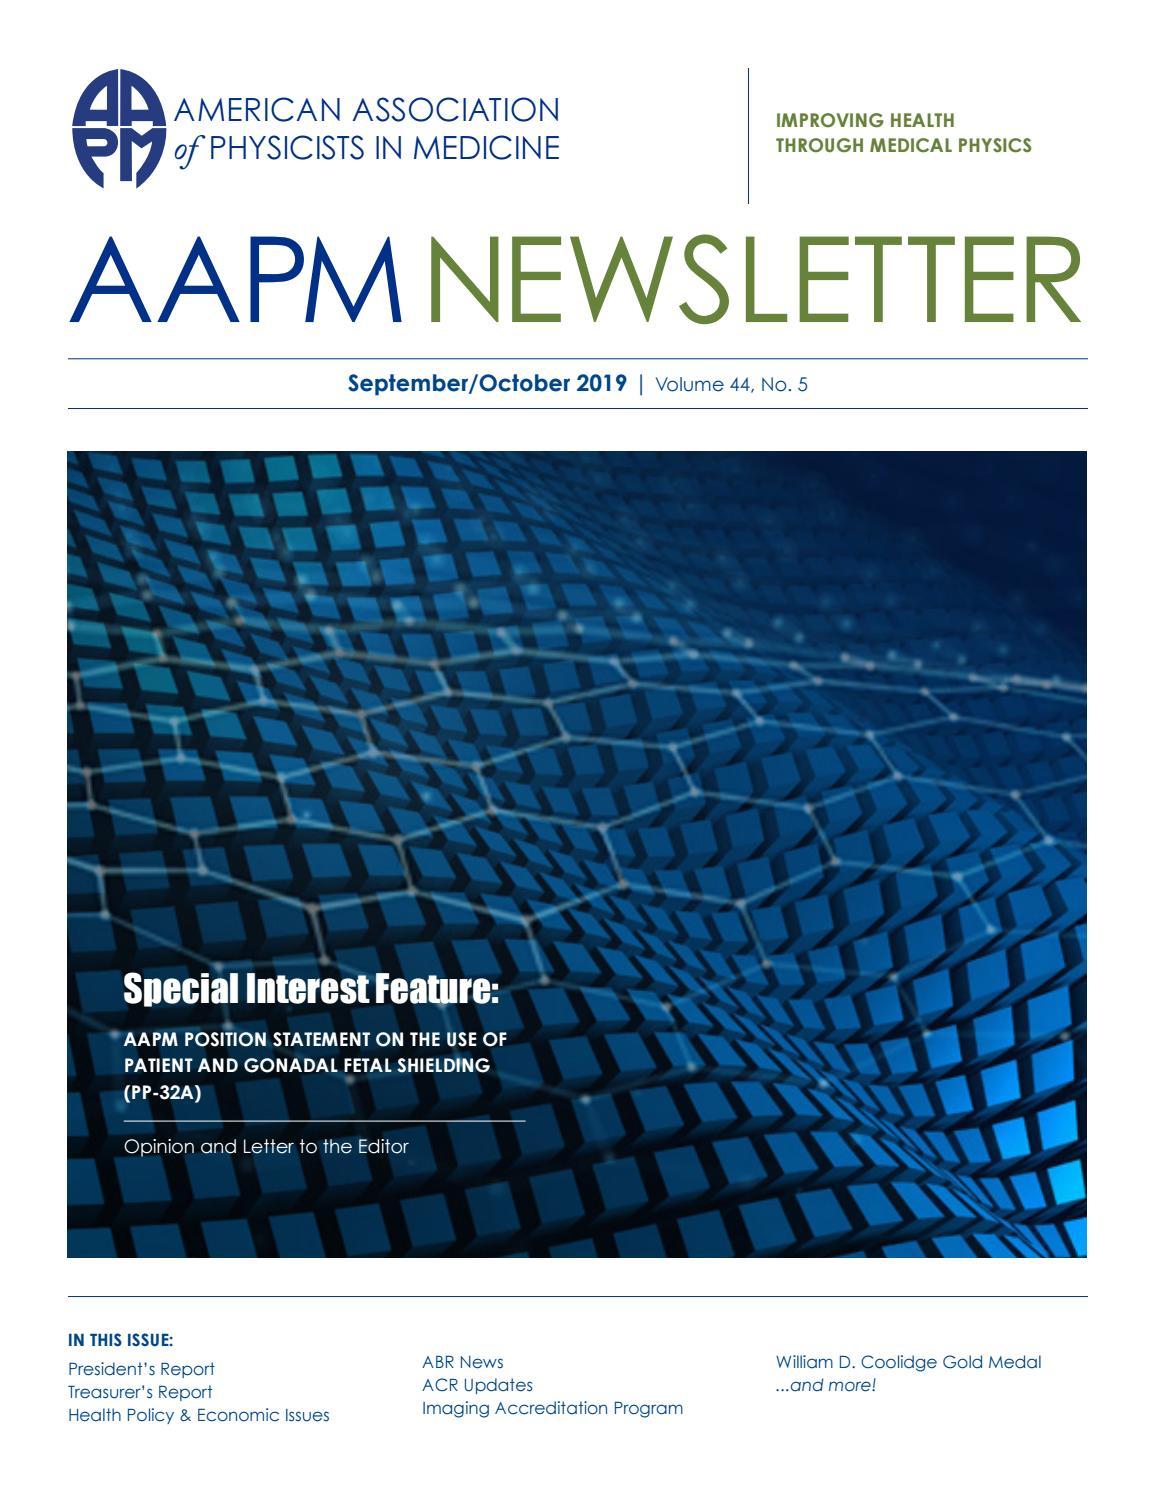 AAPM Newsletter September/October 2019 Vol  44 No  5 by